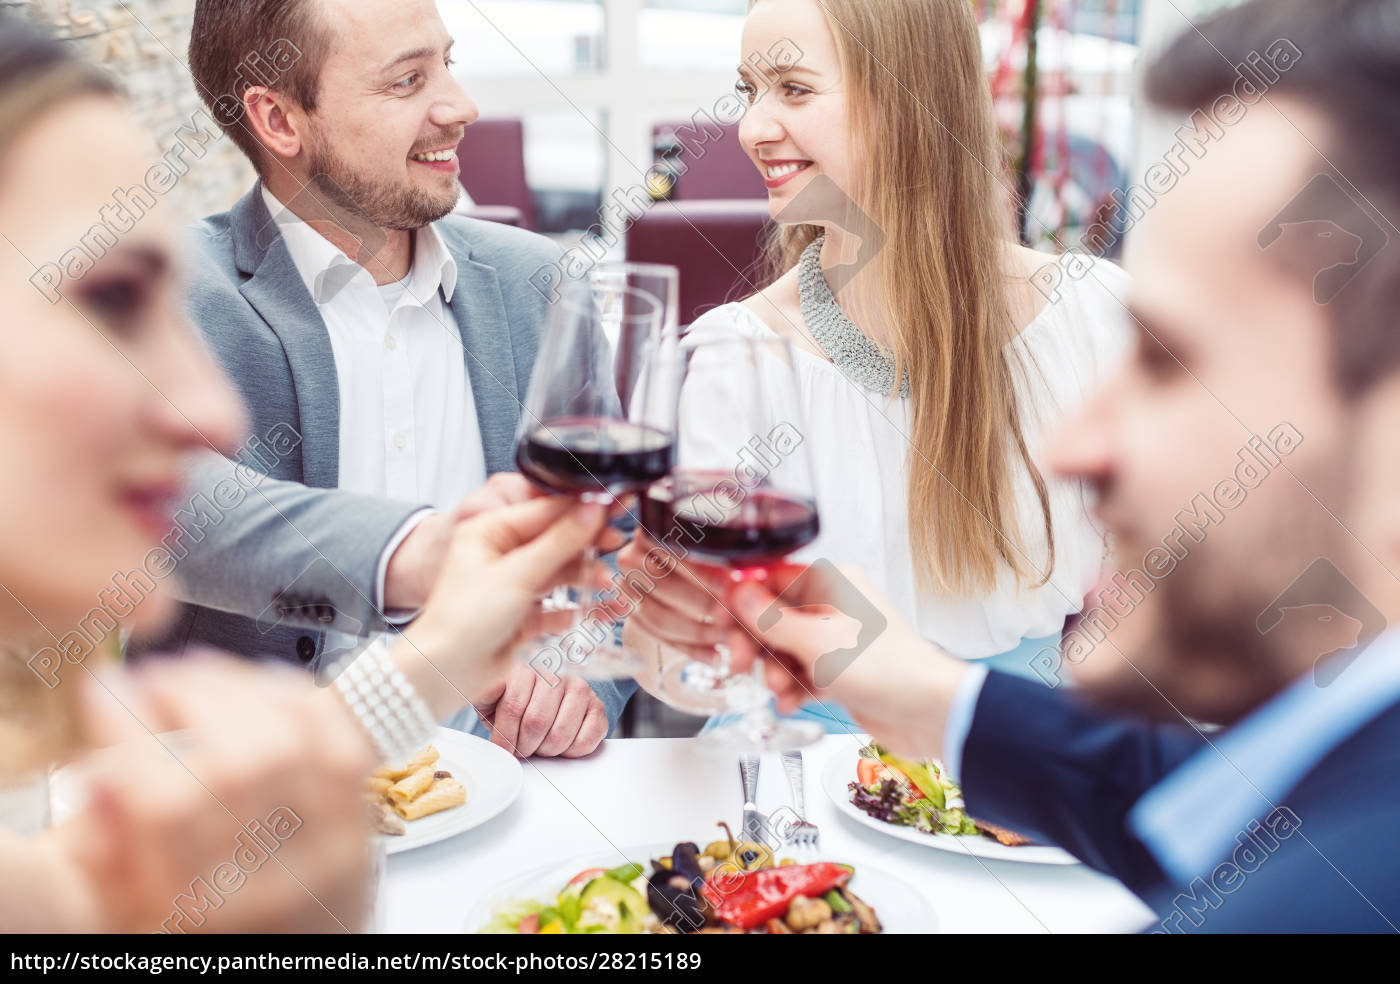 cheerful, people, enjoying, drink, and, food - 28215189